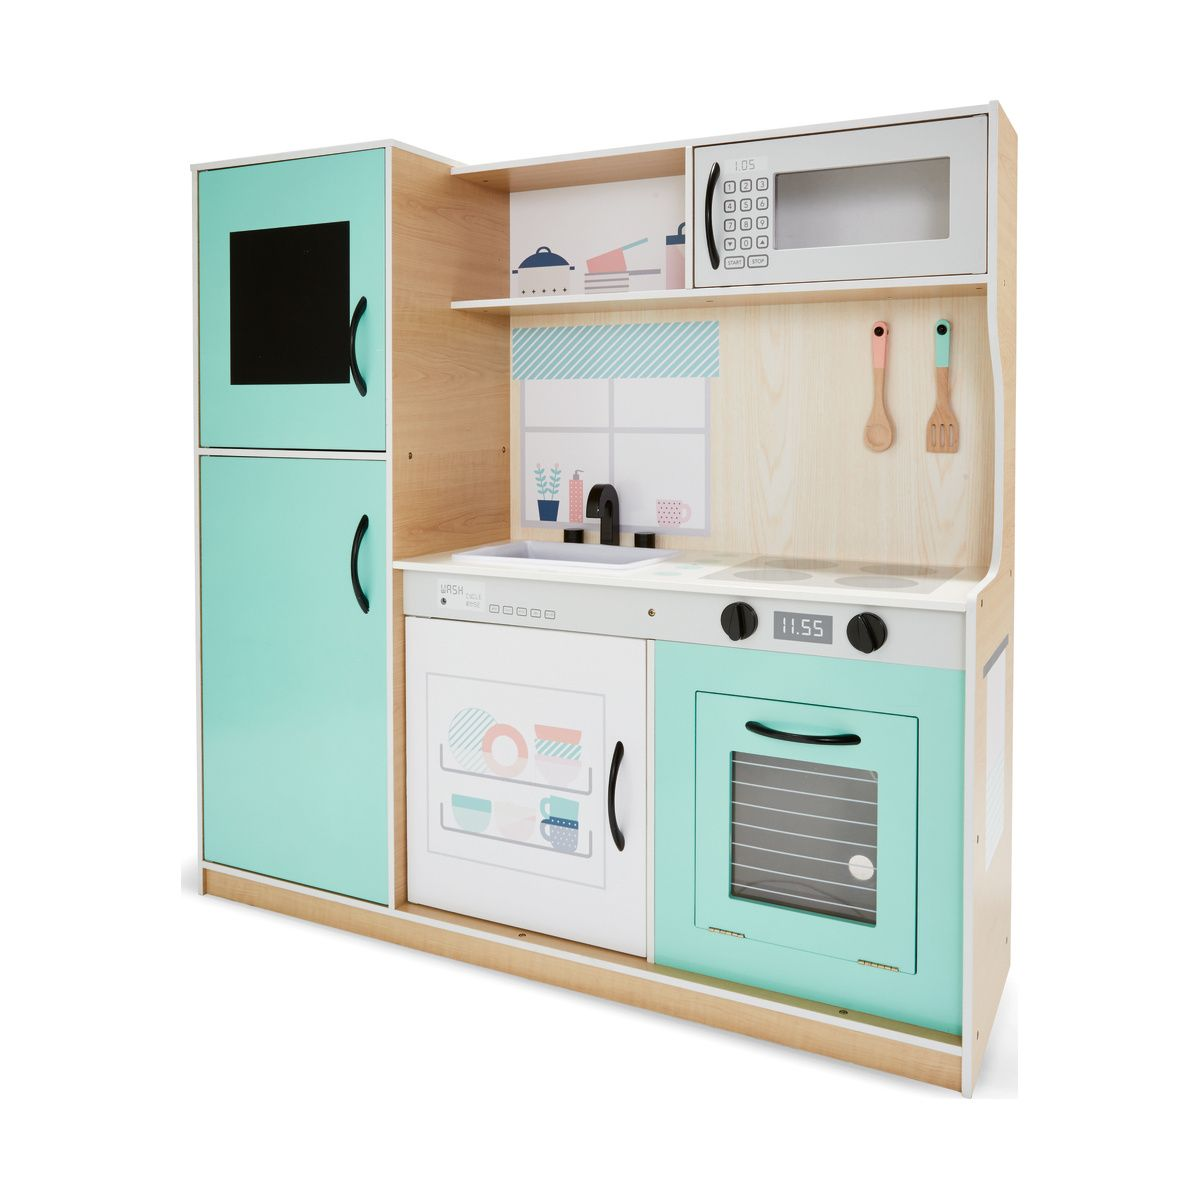 Large Wooden Kitchen Playset | Pinterest | Wooden kitchen and Kitchens